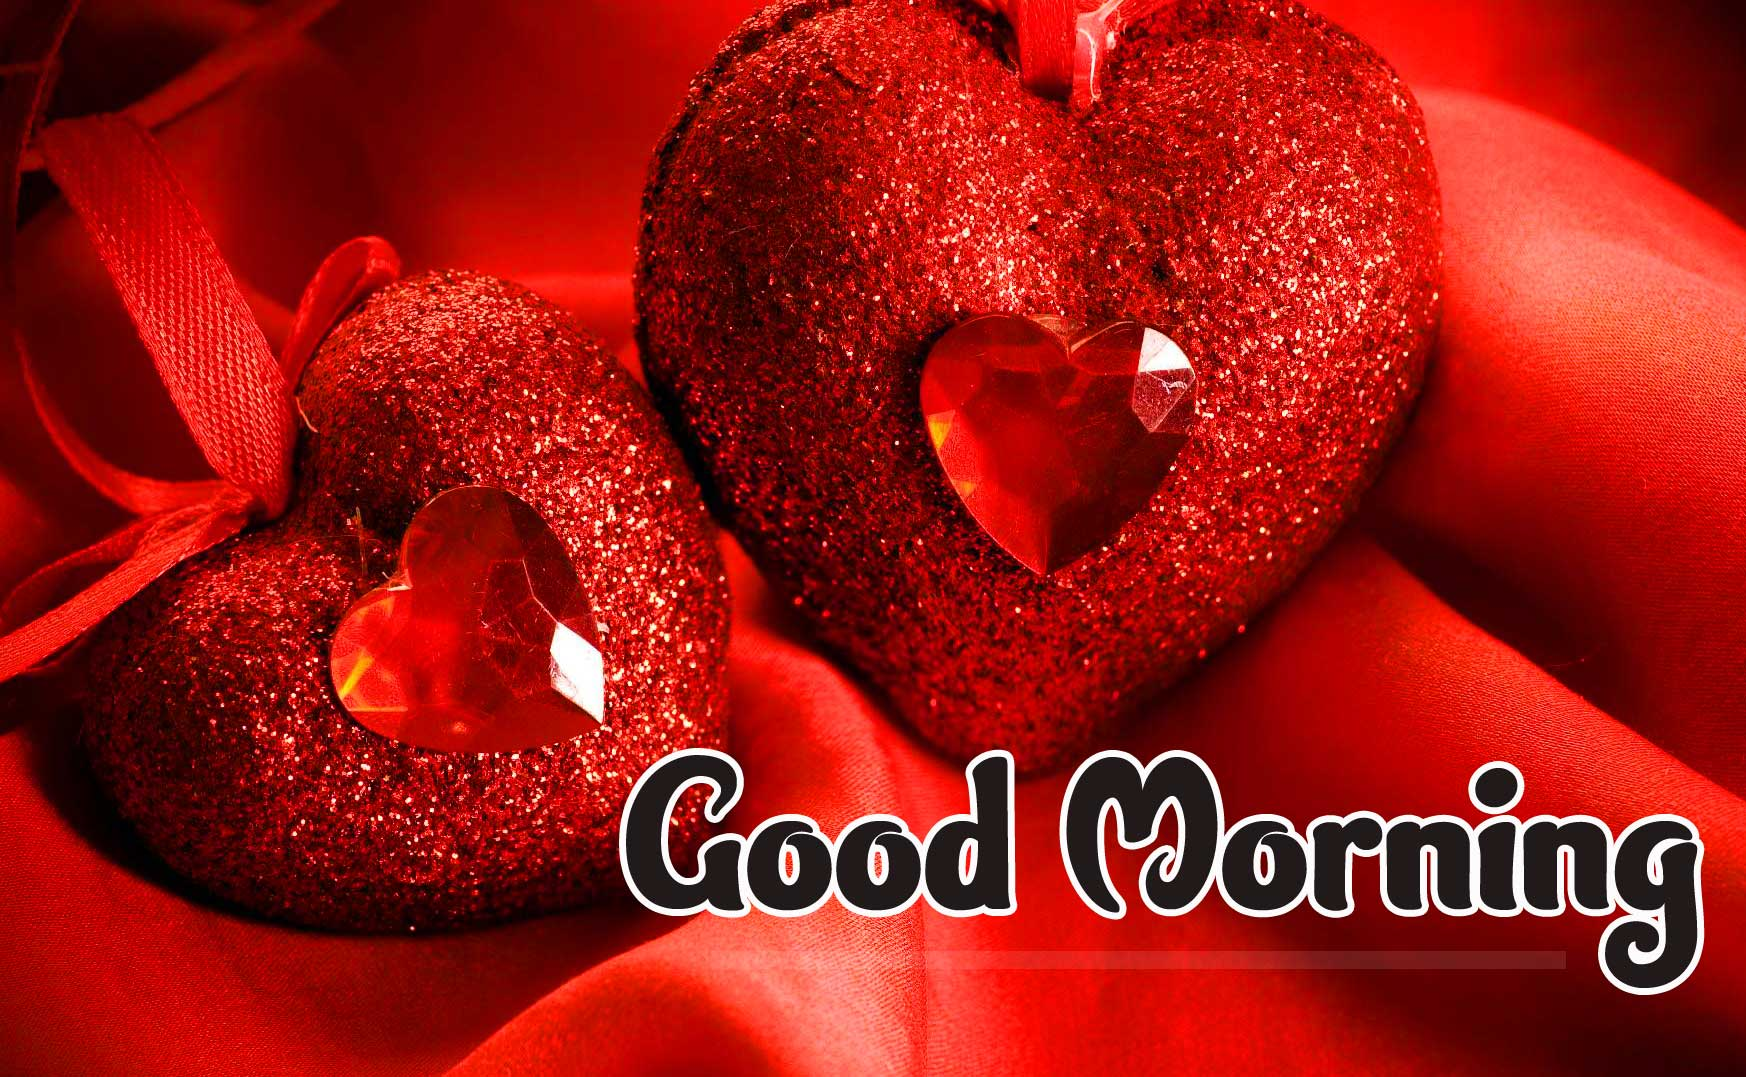 Amazing 1080 p Good Morning 4k ImagesPics Download